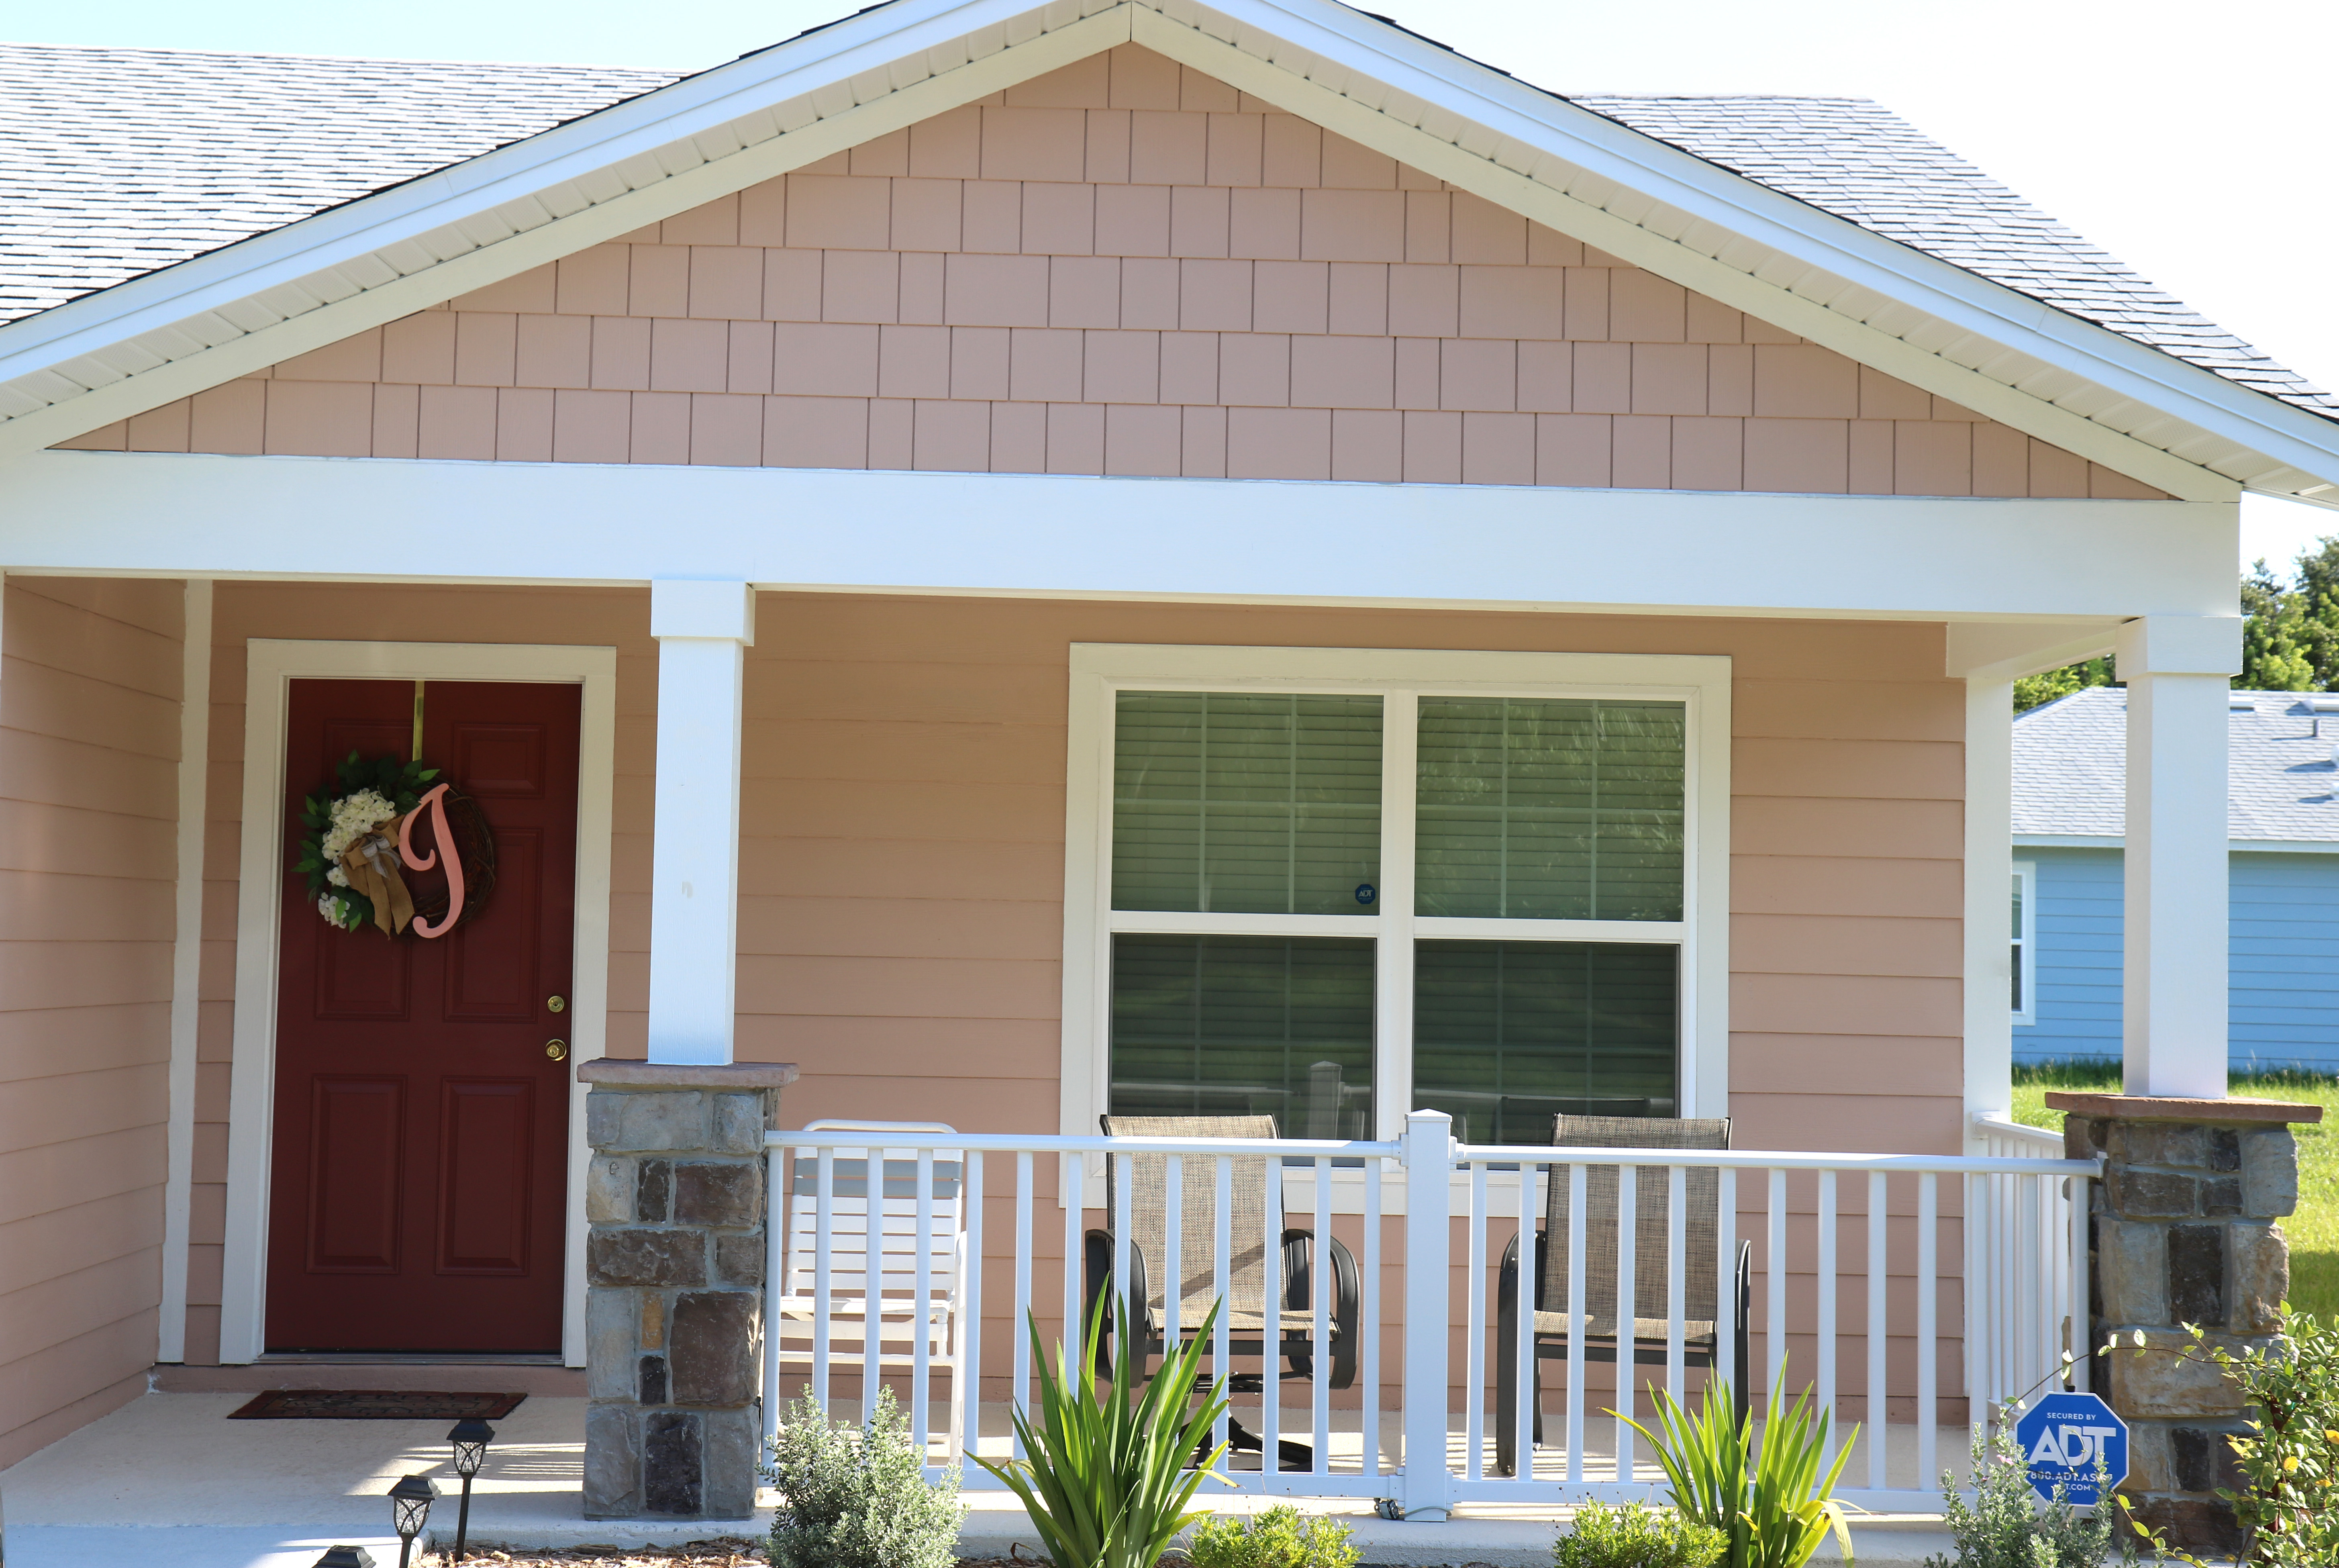 Sample Arbor Bend home exterior